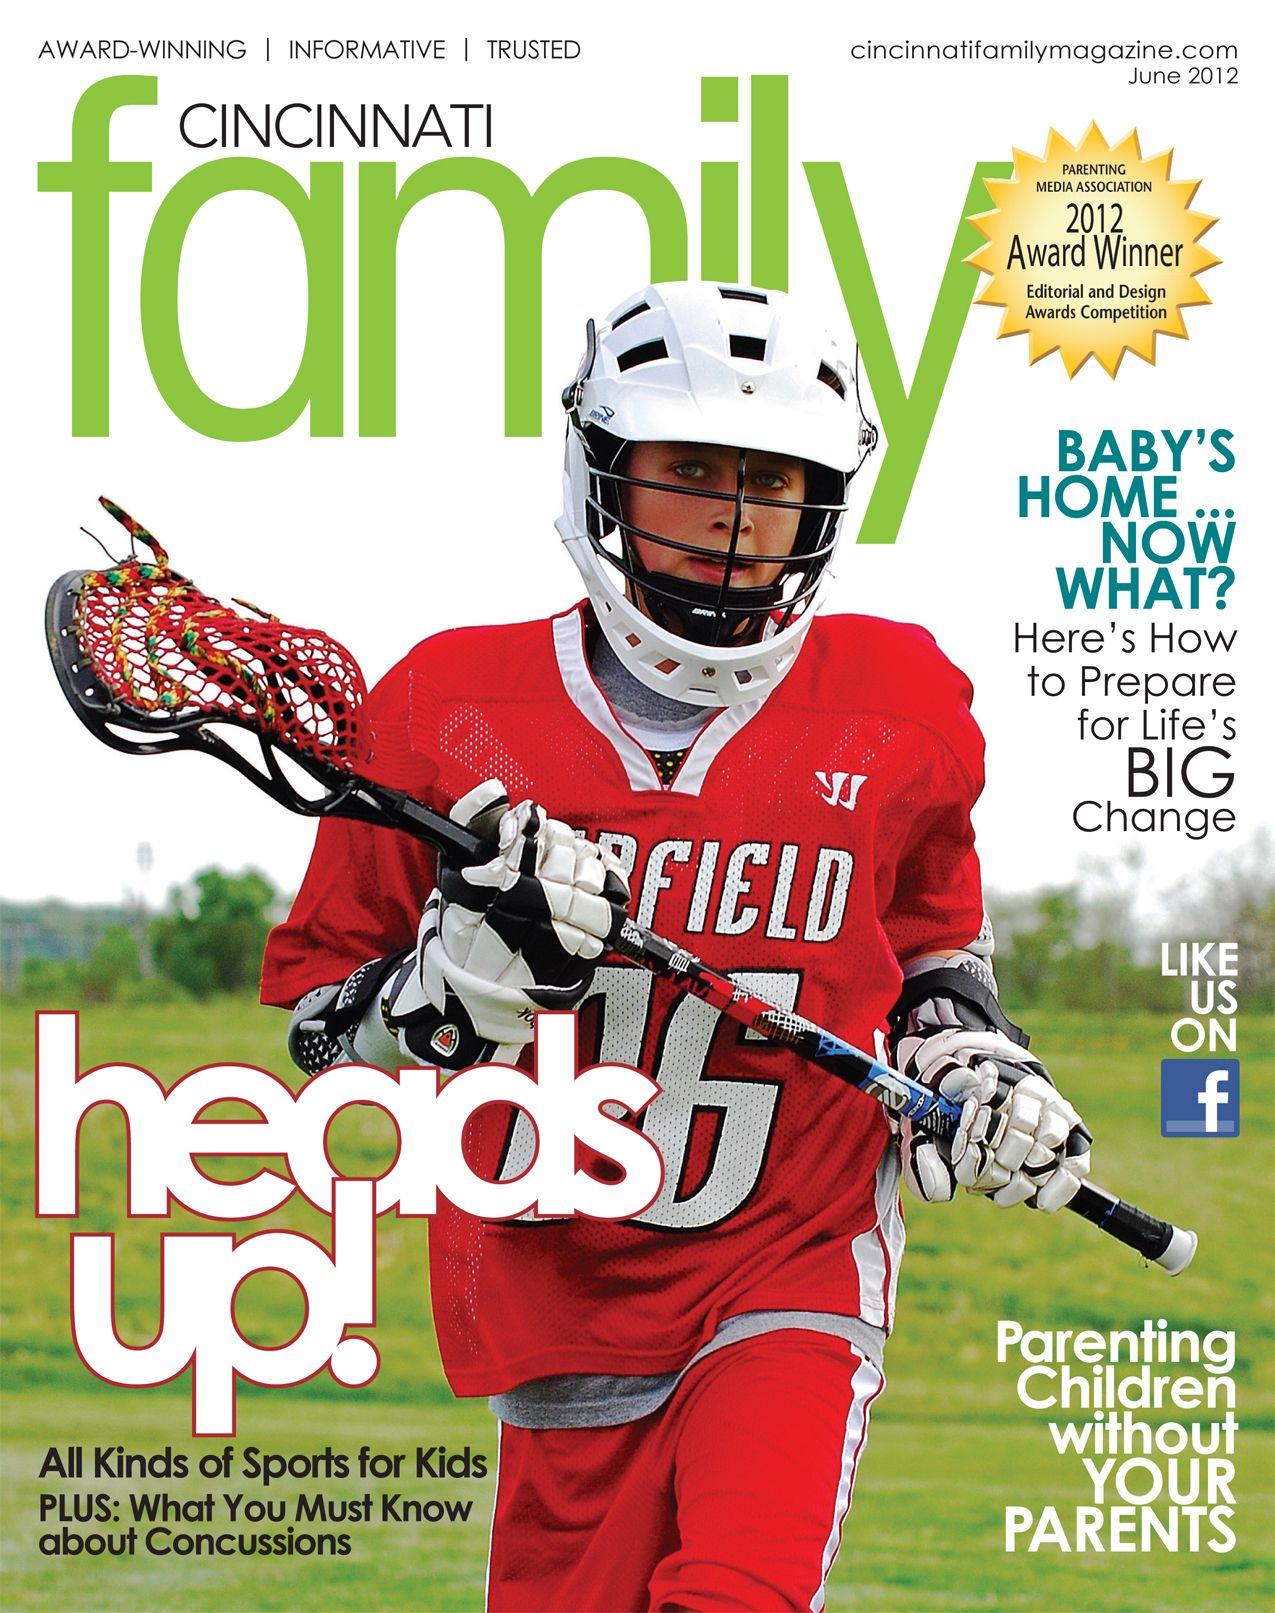 Cincinnati Family Magazine Cover June